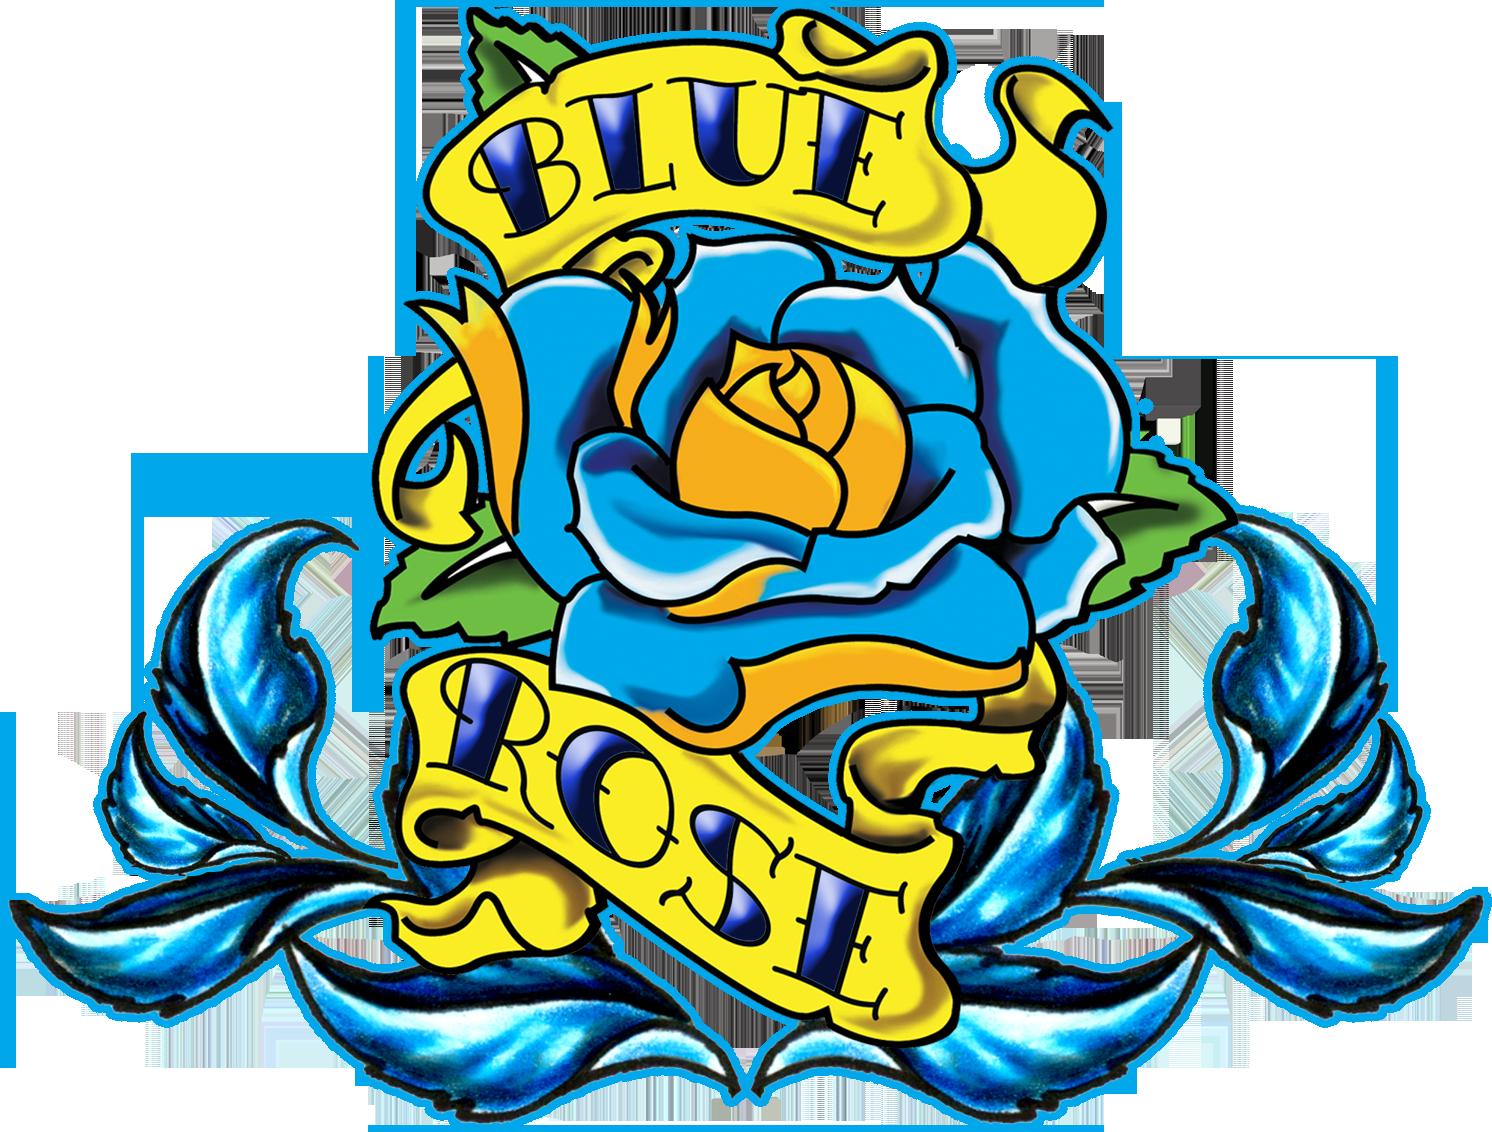 Blue Rose Tattoo & Piercing